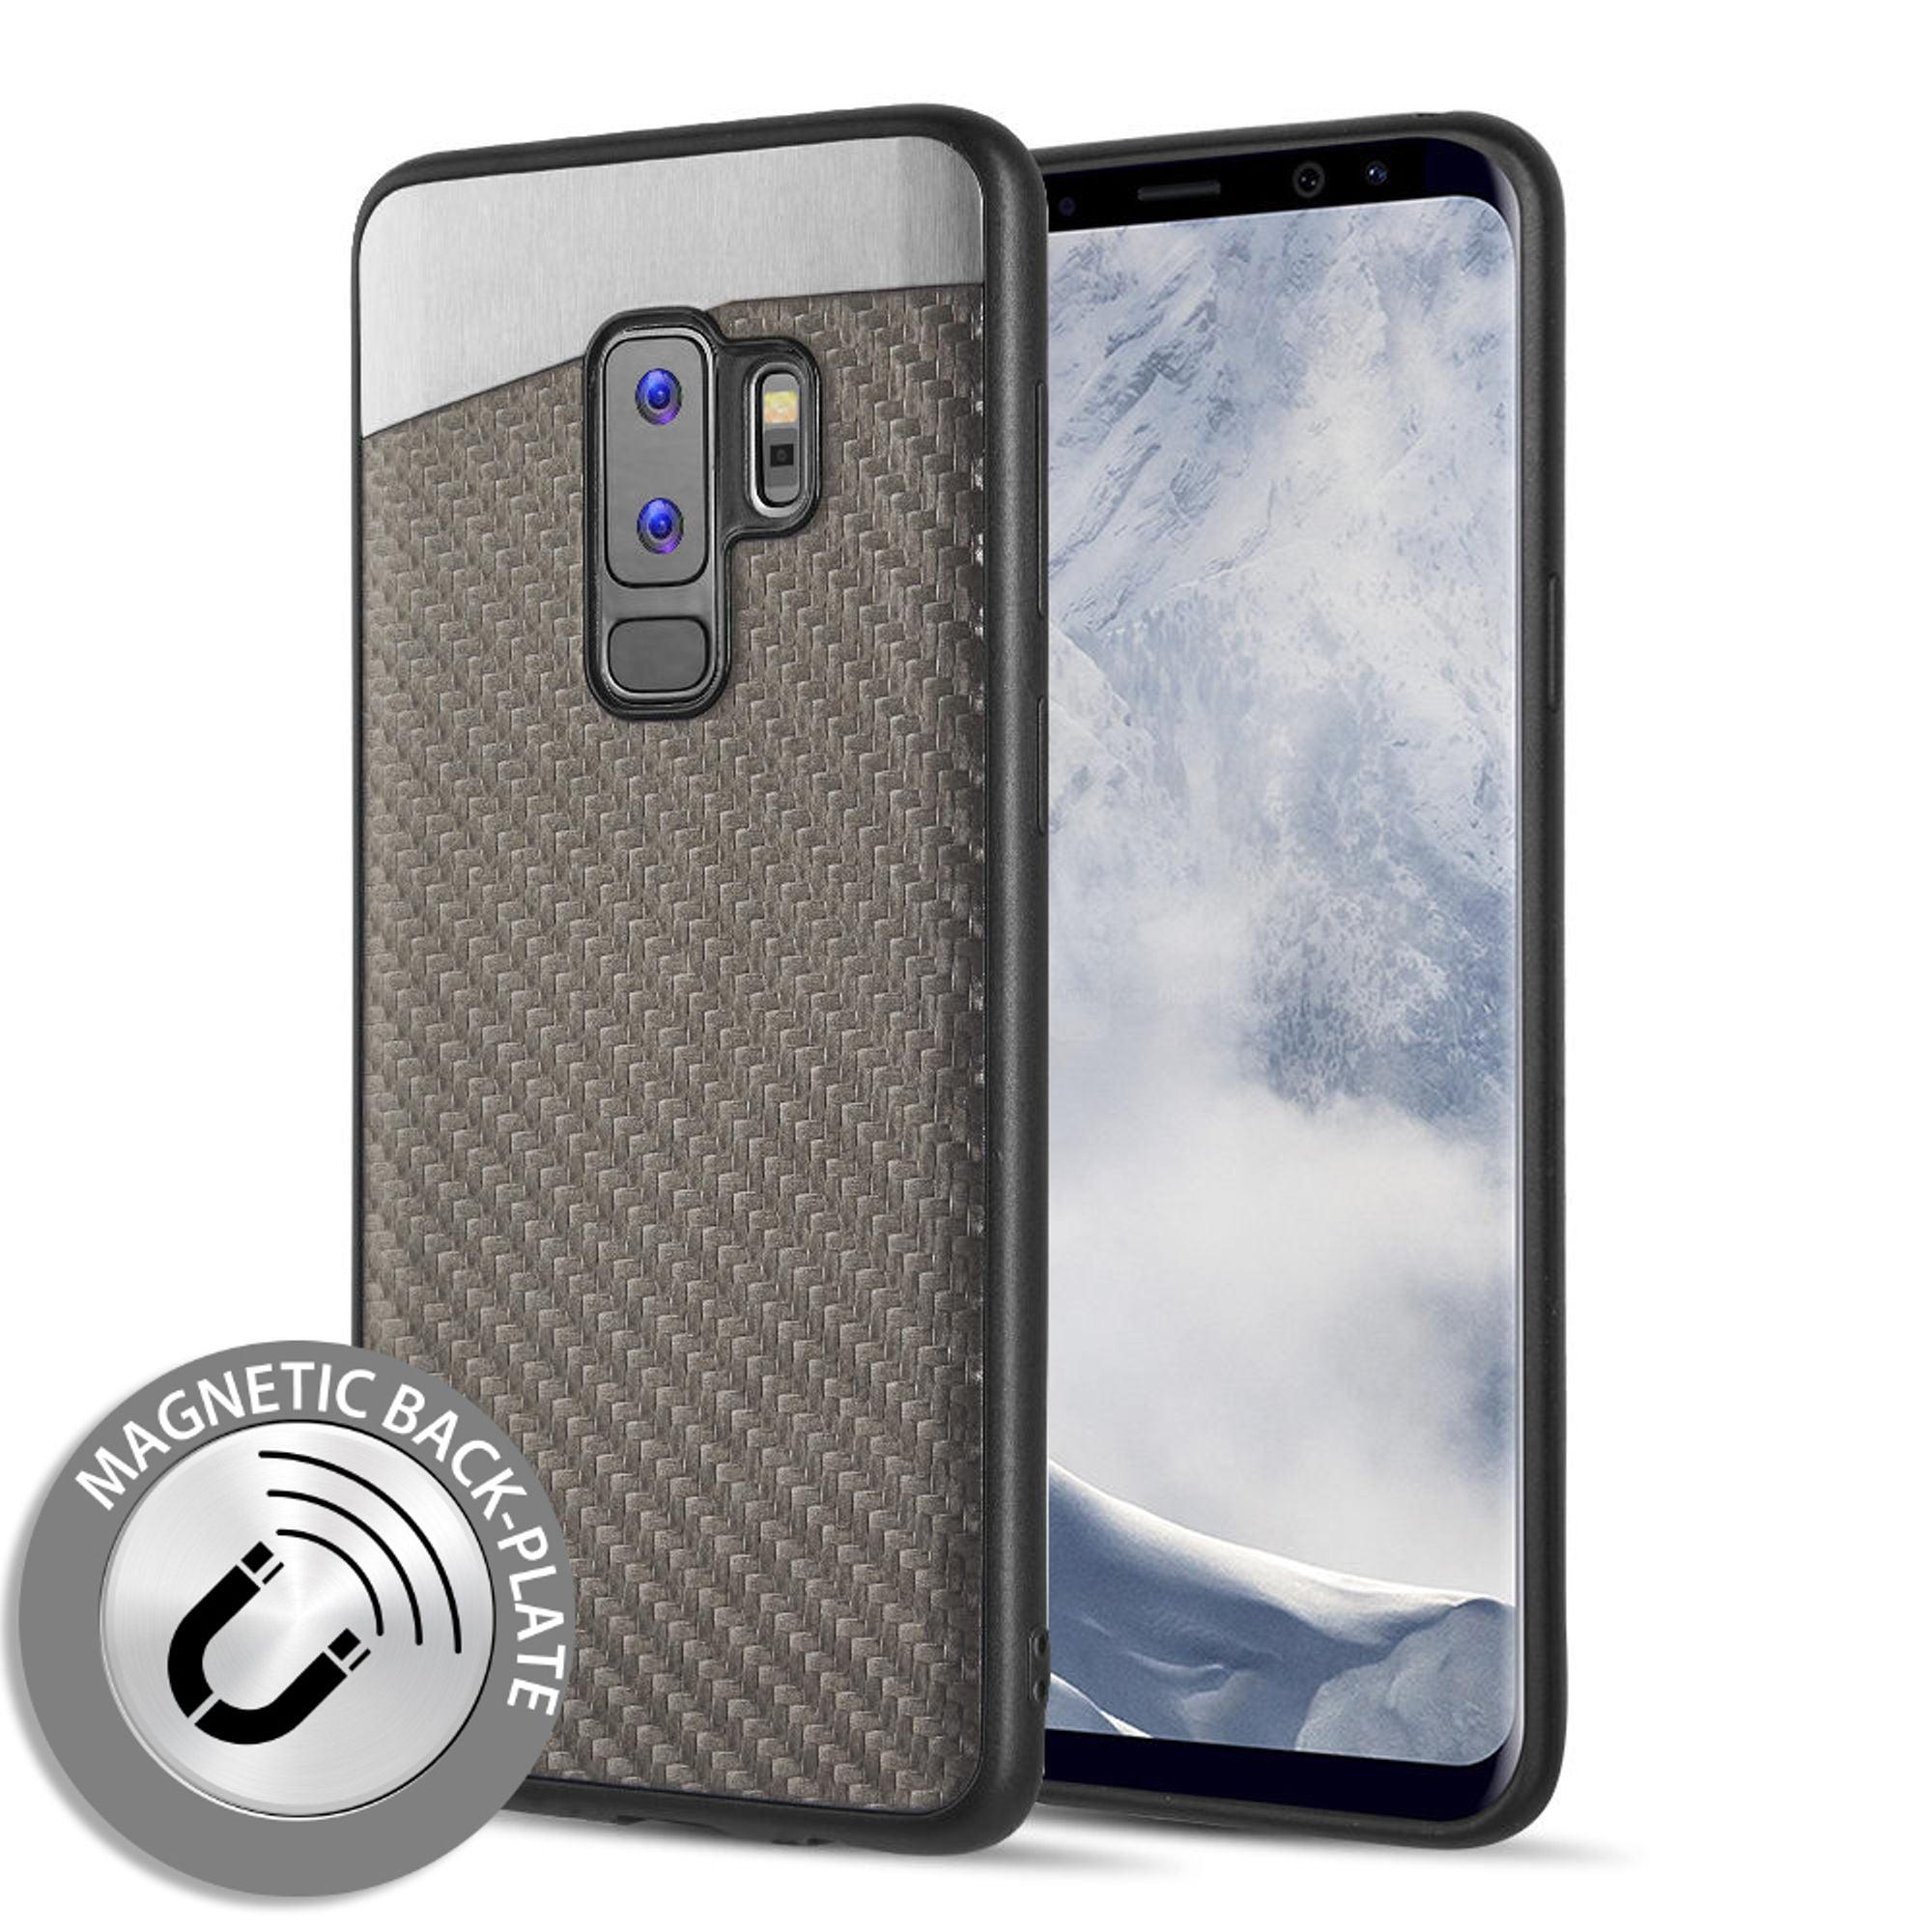 Samsung Galaxy S9 Plus Case, by Insten Carbon Metallic Fusion Fiber Rubber TPU Case Phone Cover For Samsung Galaxy S9 Plus